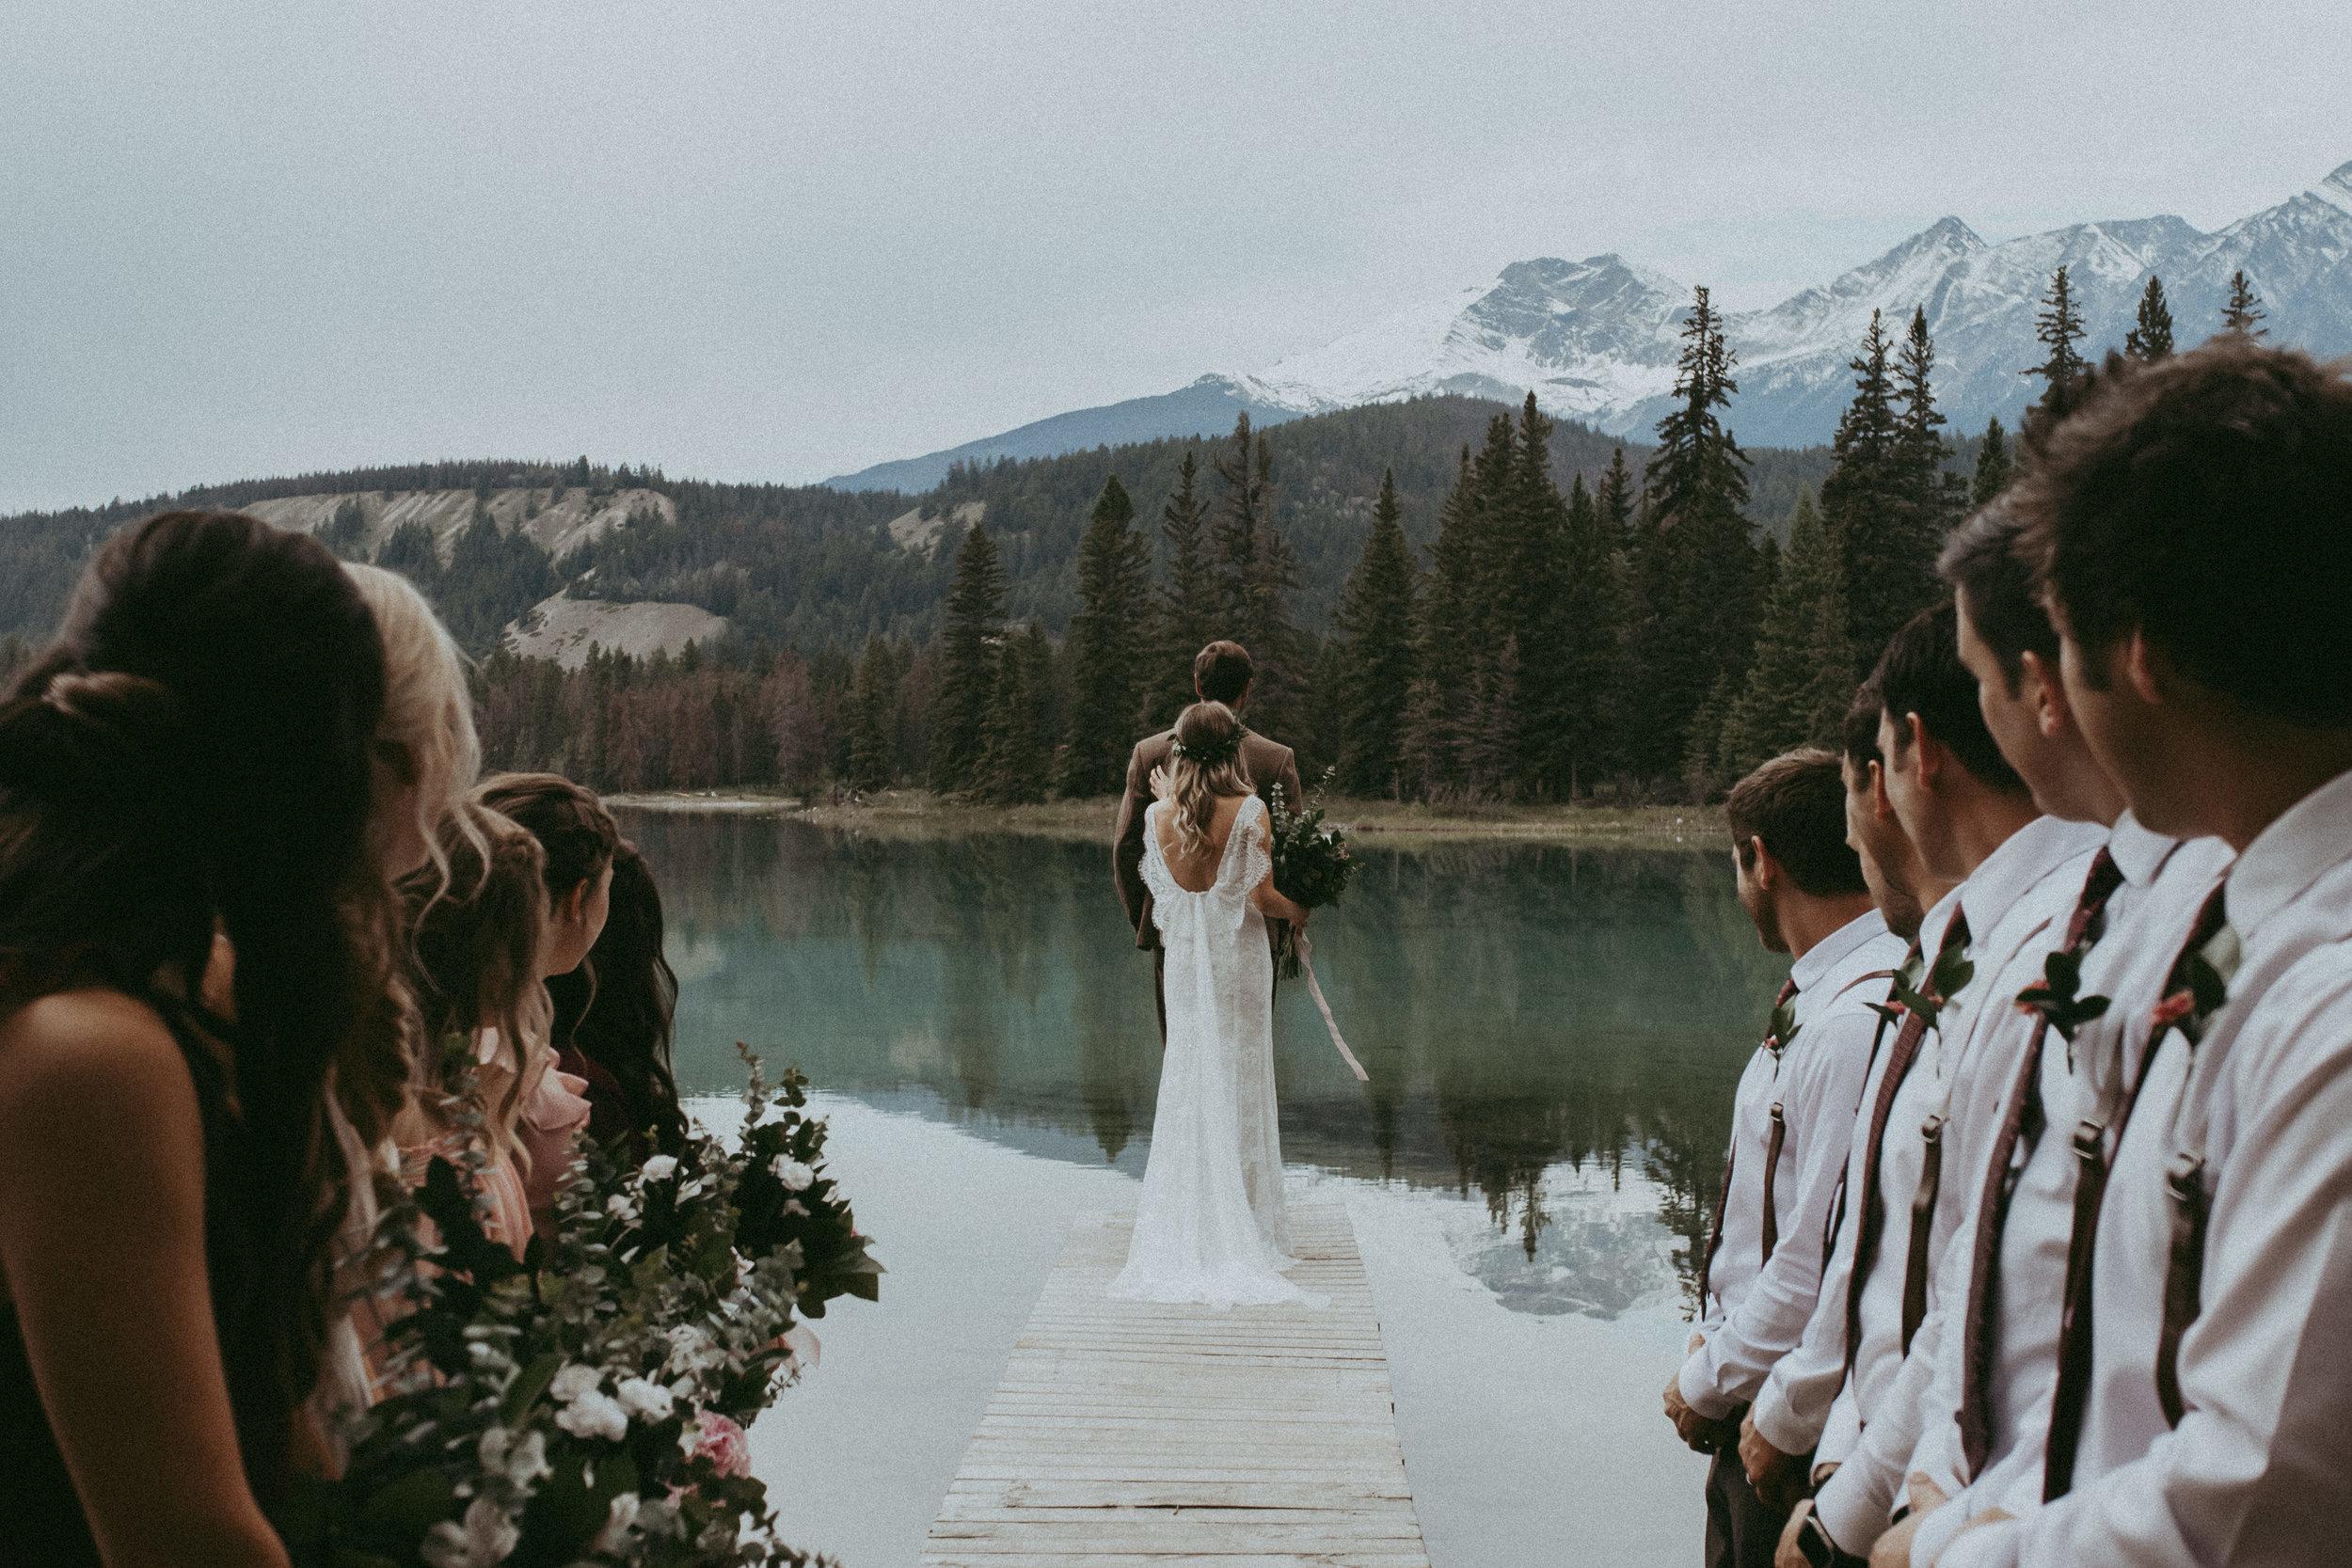 19-06-22 - Rebecca & Aaron - Jasper Wedding - Rocky Mountain Wedding-48.jpg